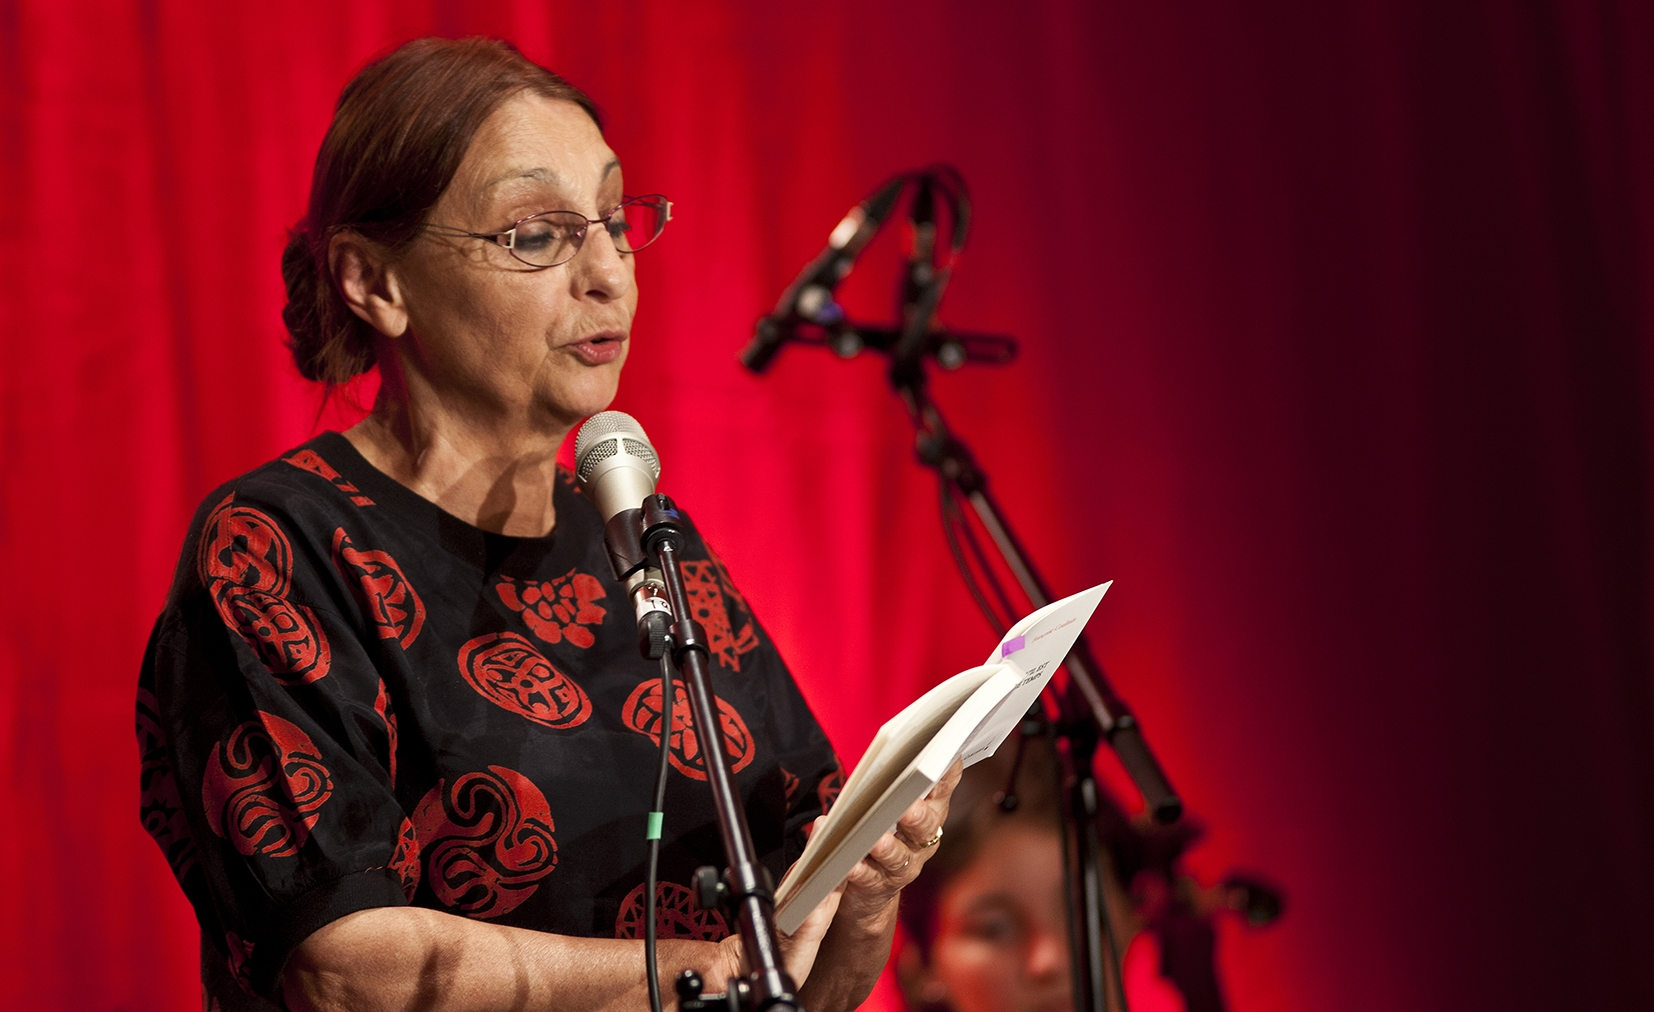 Chantal Coulmin